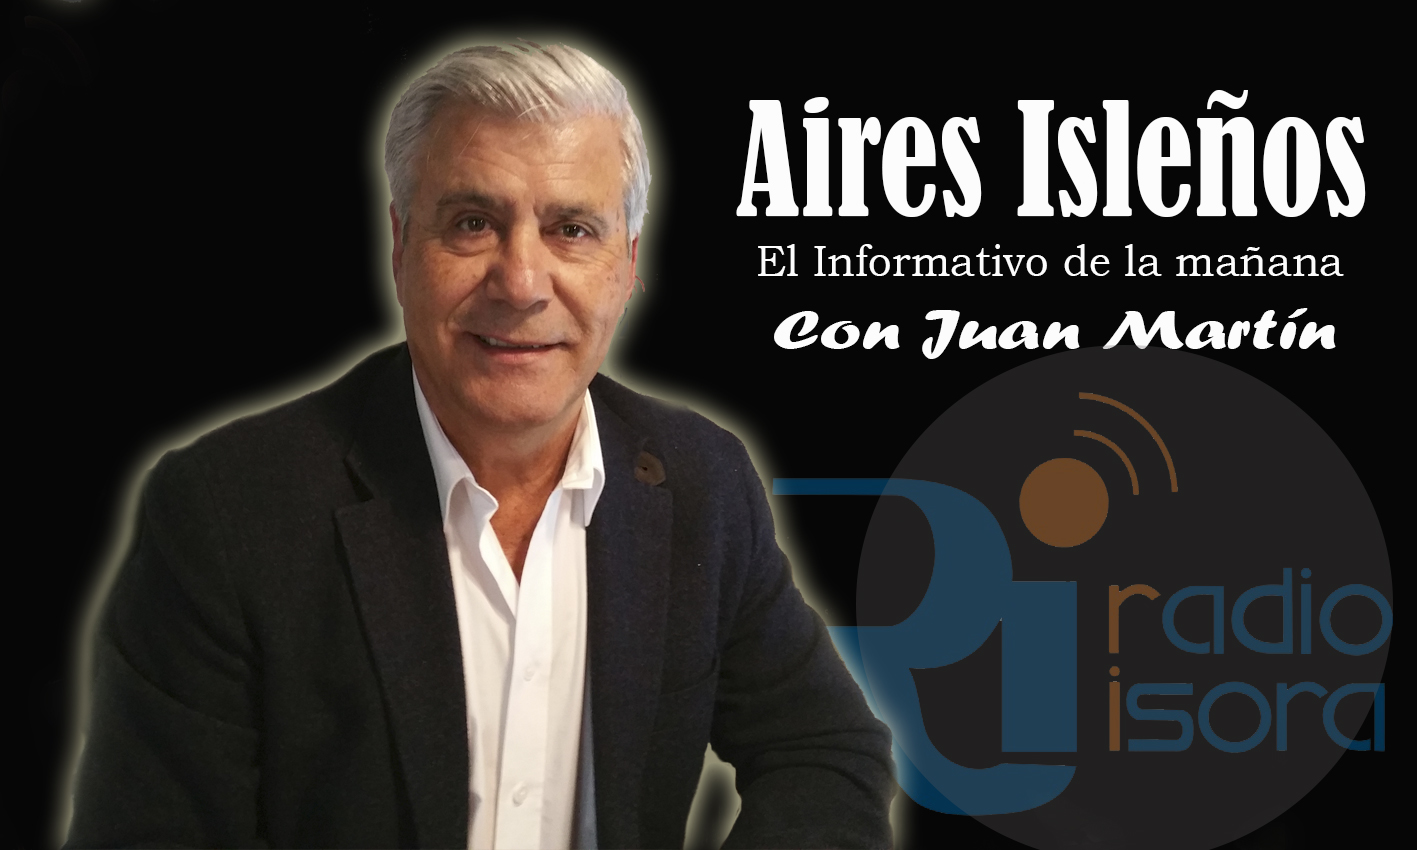 AIRES ISLEÑOS, Foto 2